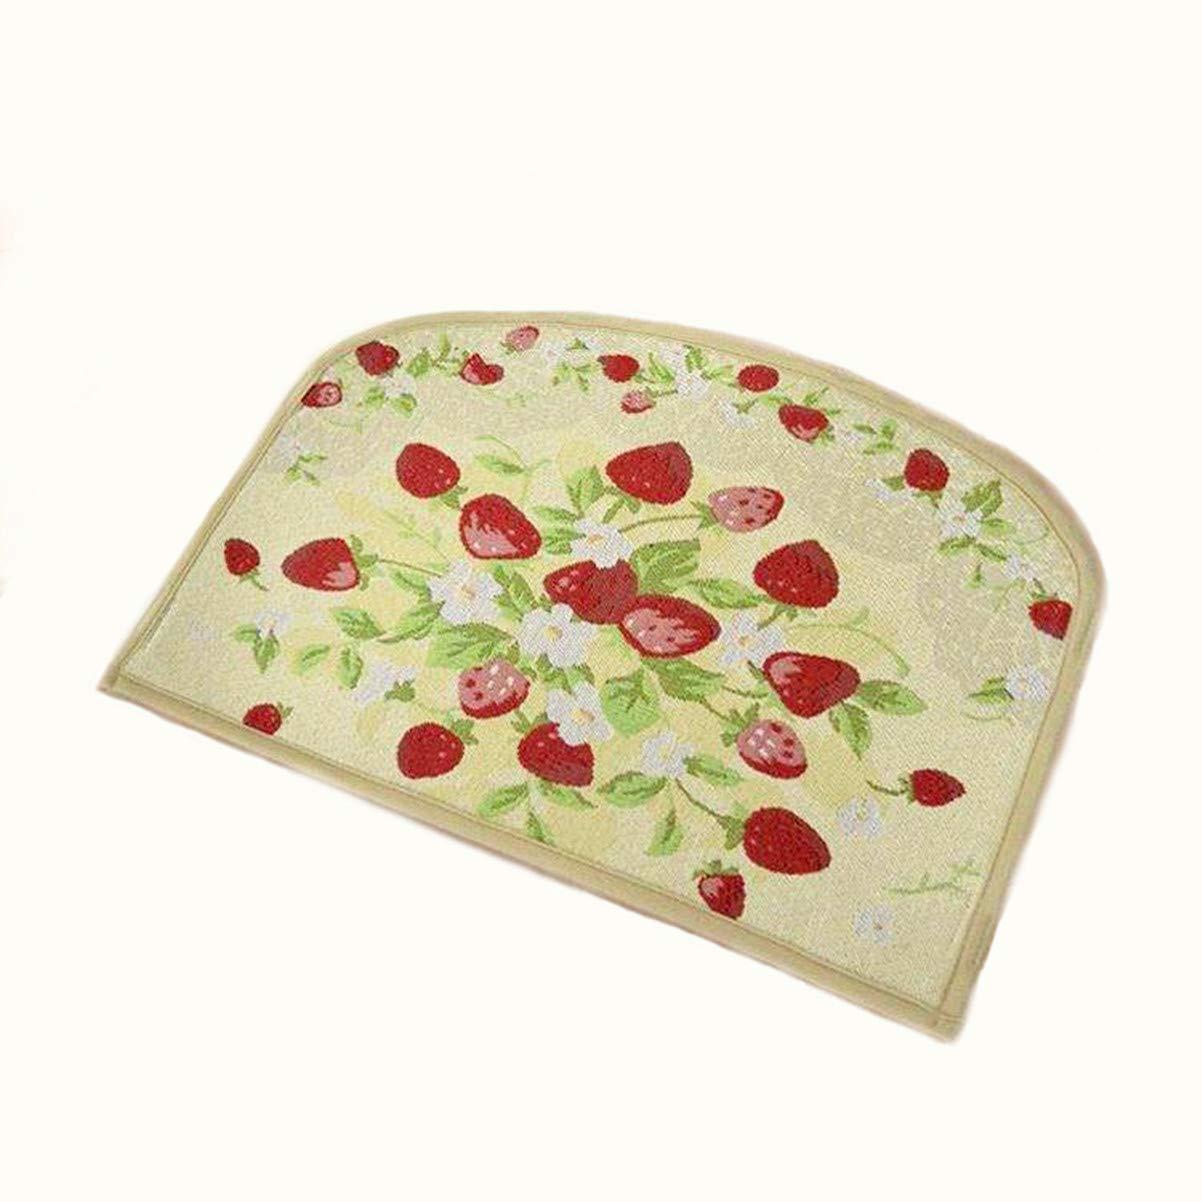 Cliab Strawberry Kitchen Rugs (18 X 24 X 0.2 Inch)